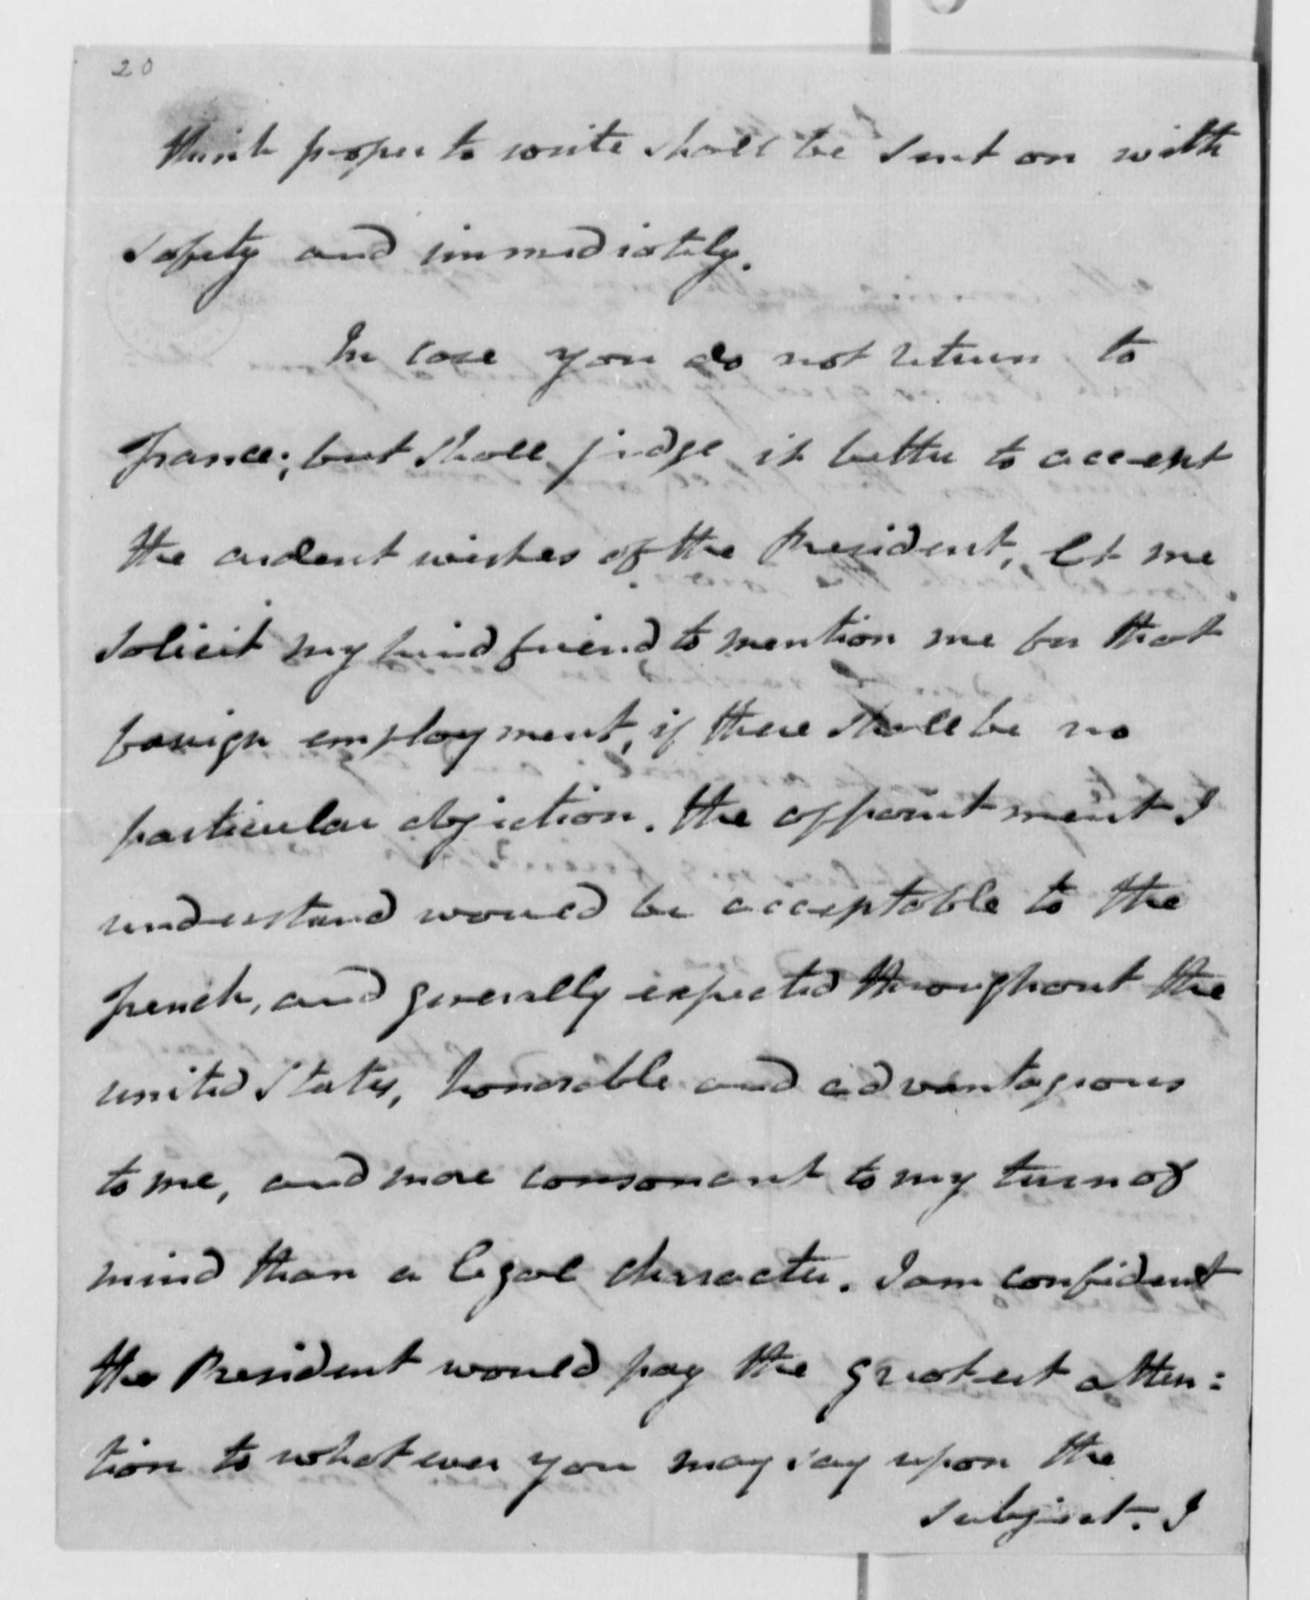 Cyrus Griffin to Thomas Jefferson, December 11, 1789